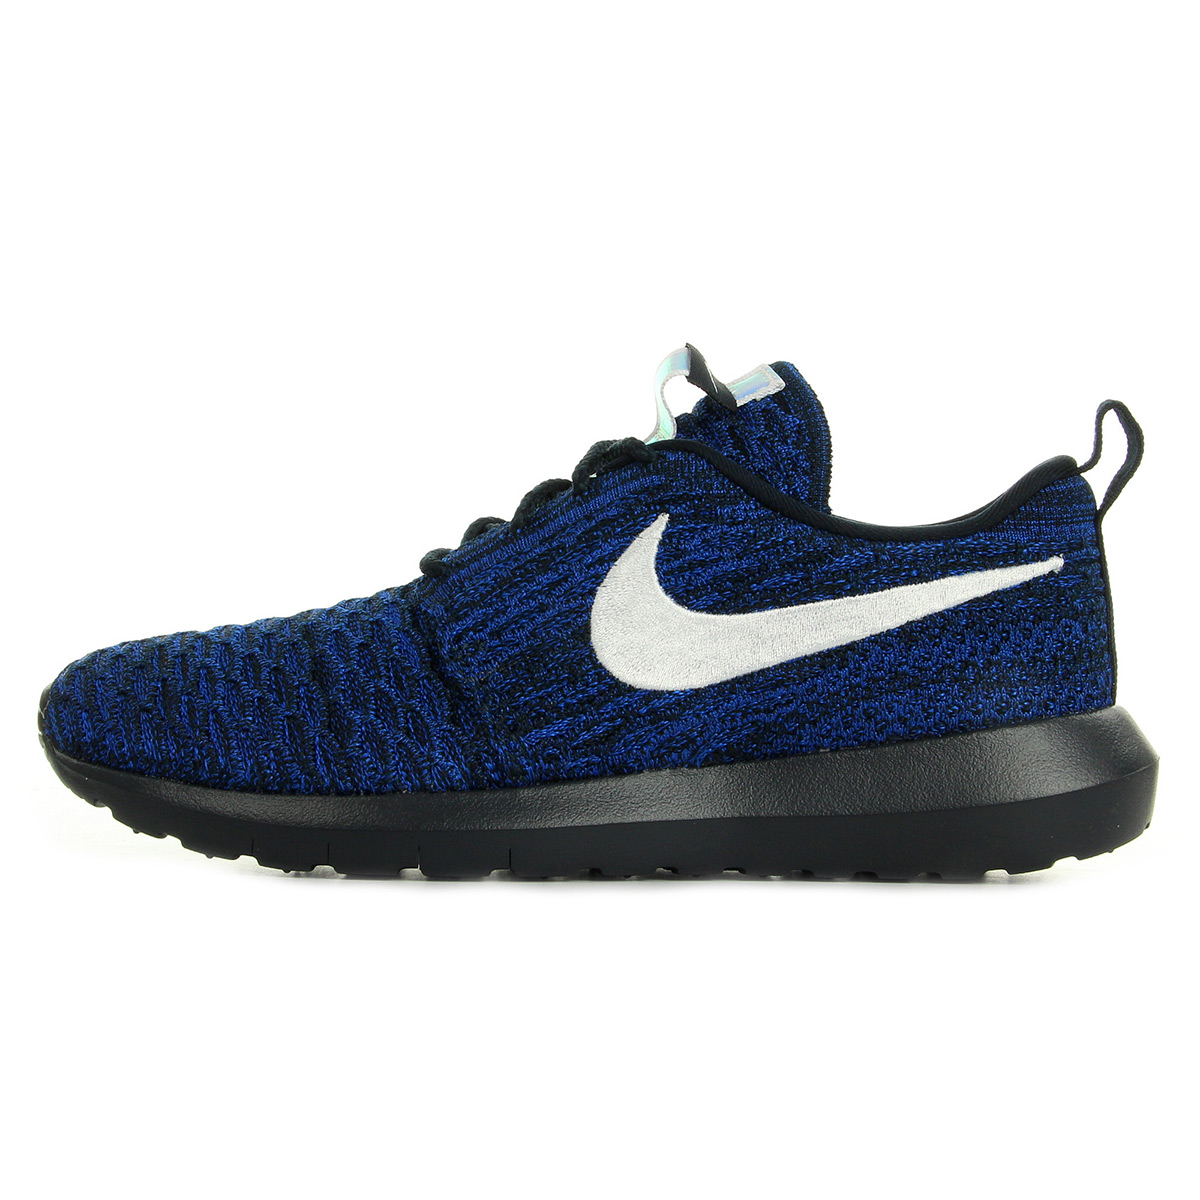 new style cef9e b0f65 Nike Roshe Nm Flyknit